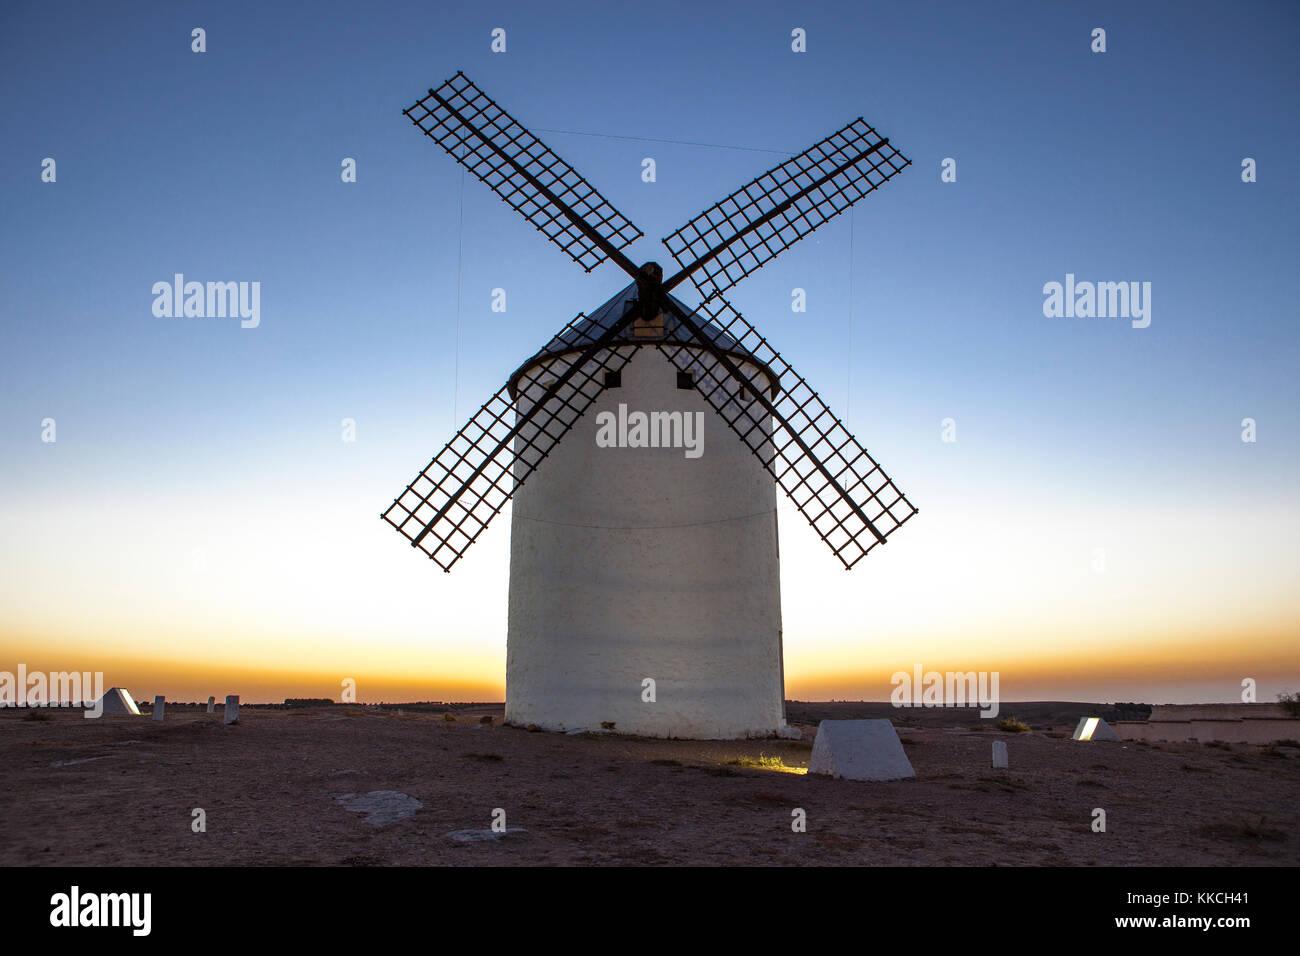 Illuminated traditional windmill at rising, Campo de Criptana, Spain - Stock Image